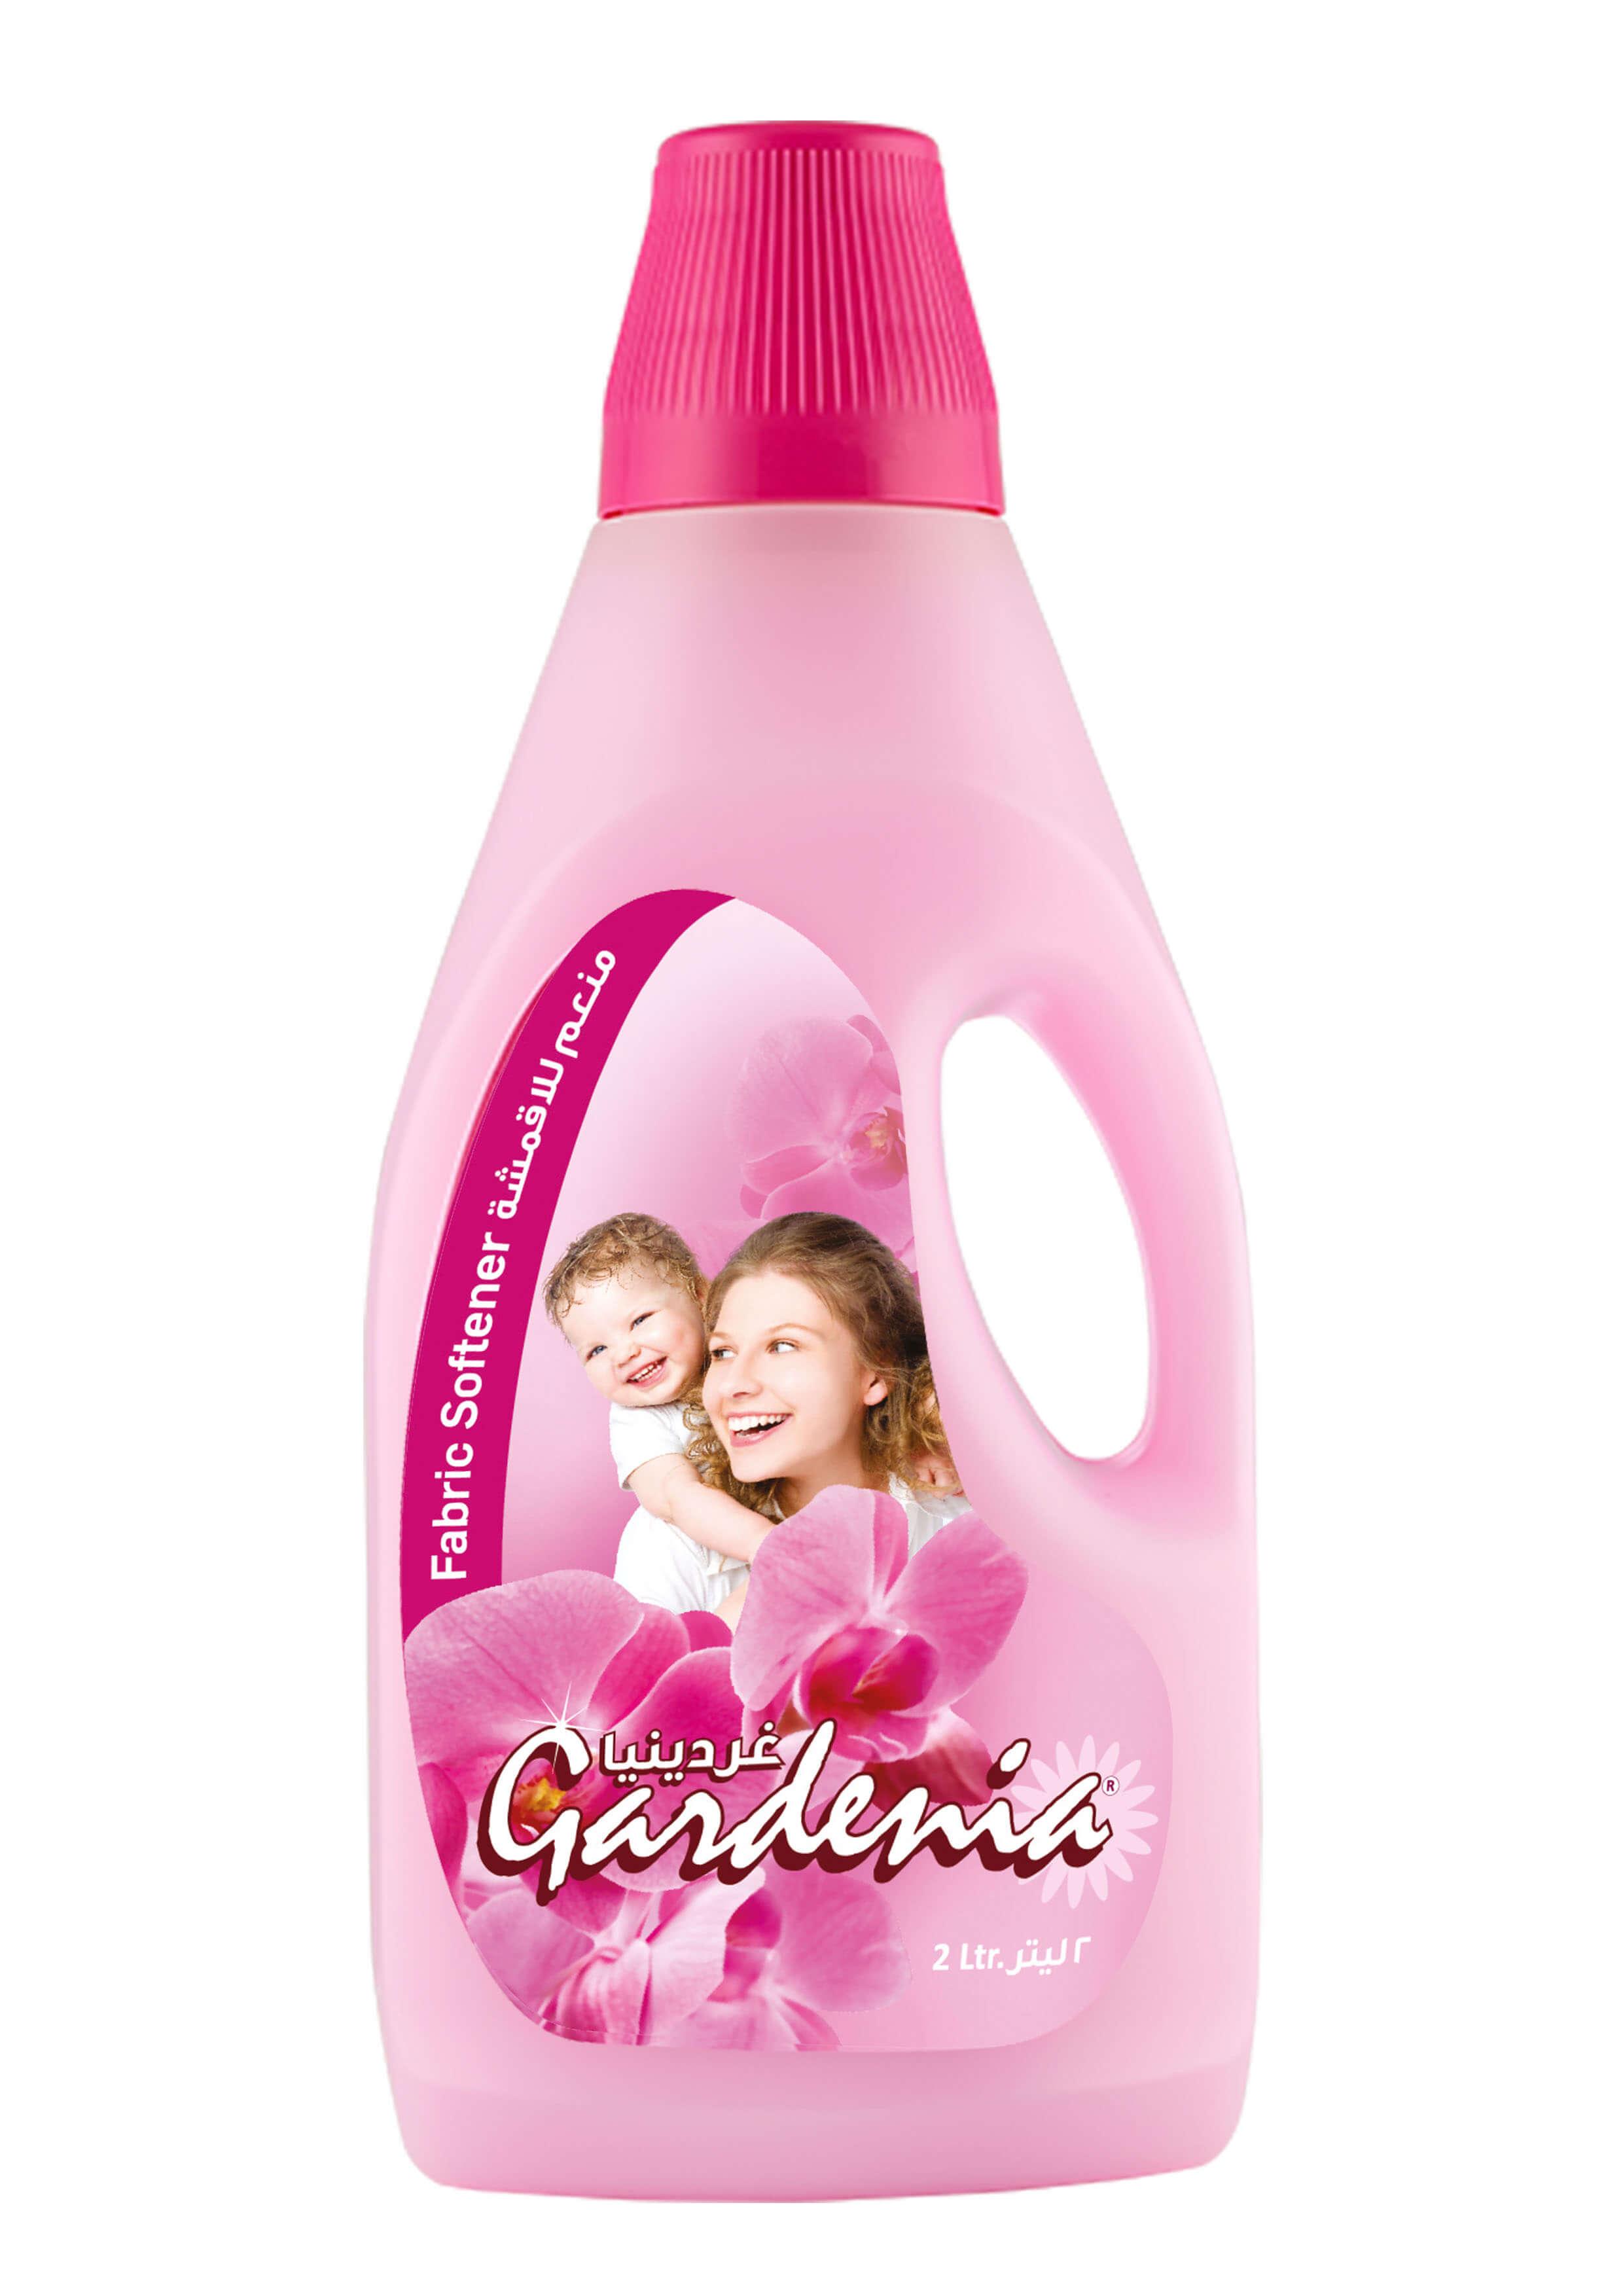 Gardenia Fabric Softener Laundry Products Fayfa Chemicals